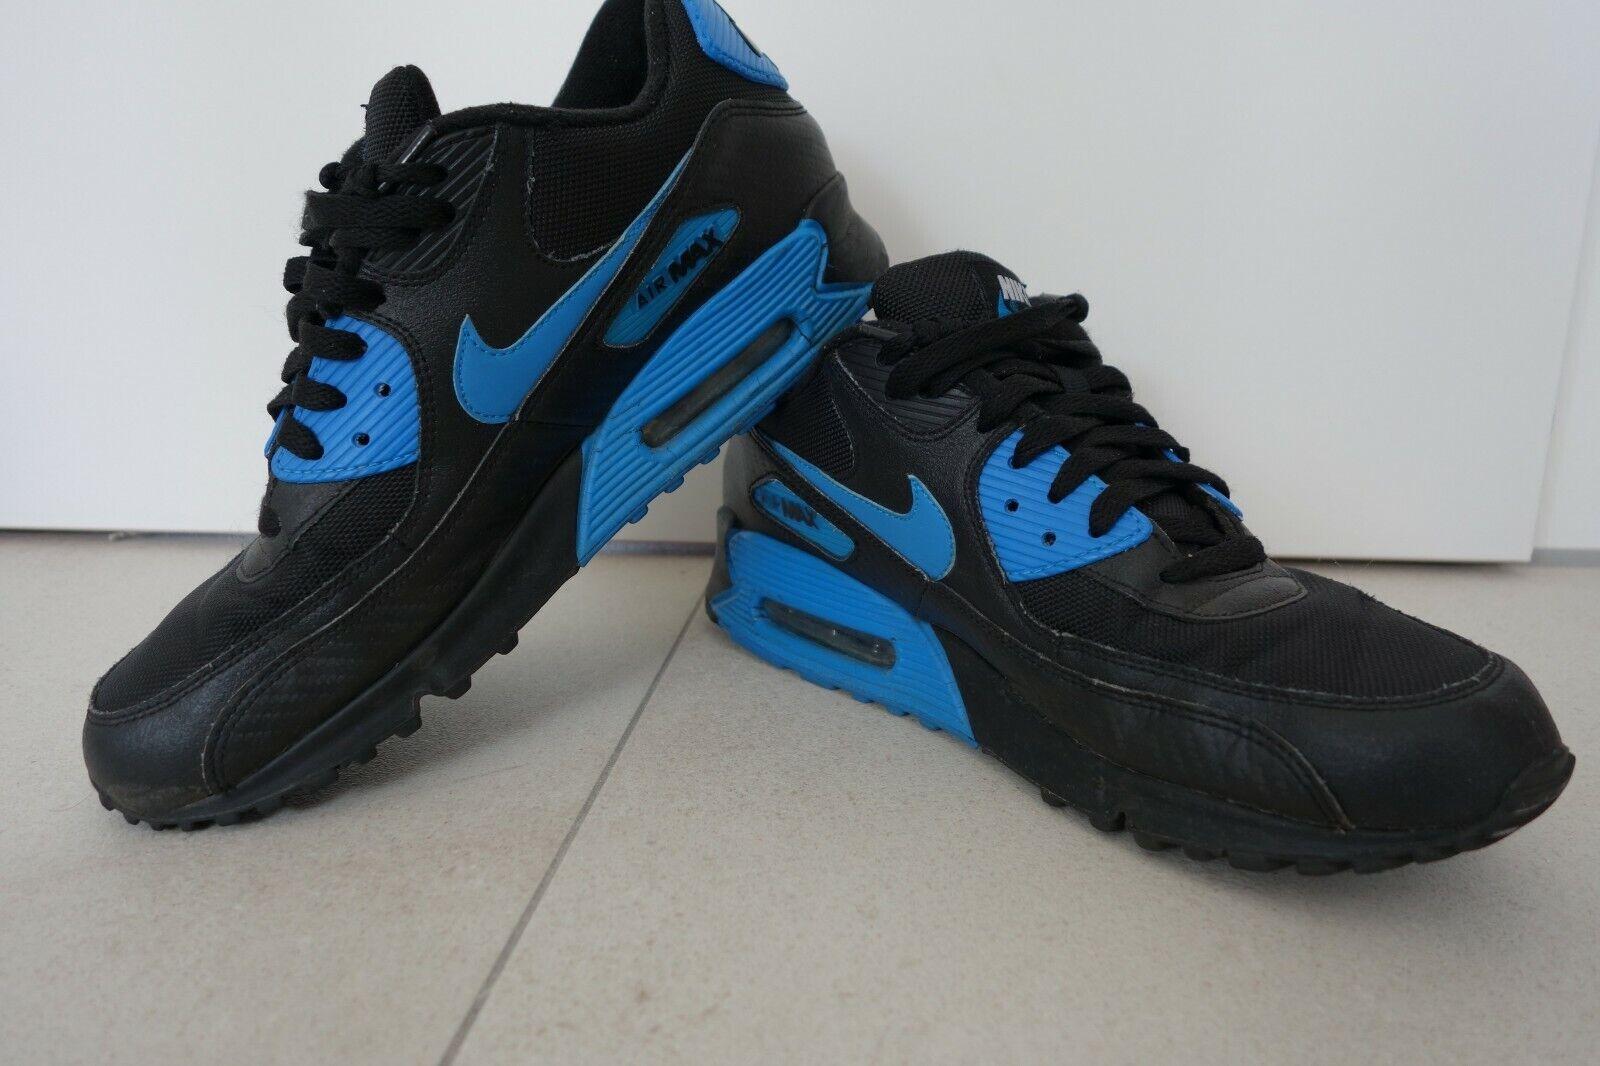 Nike Air Max 90 noir bleu EU 44 us 10 porté